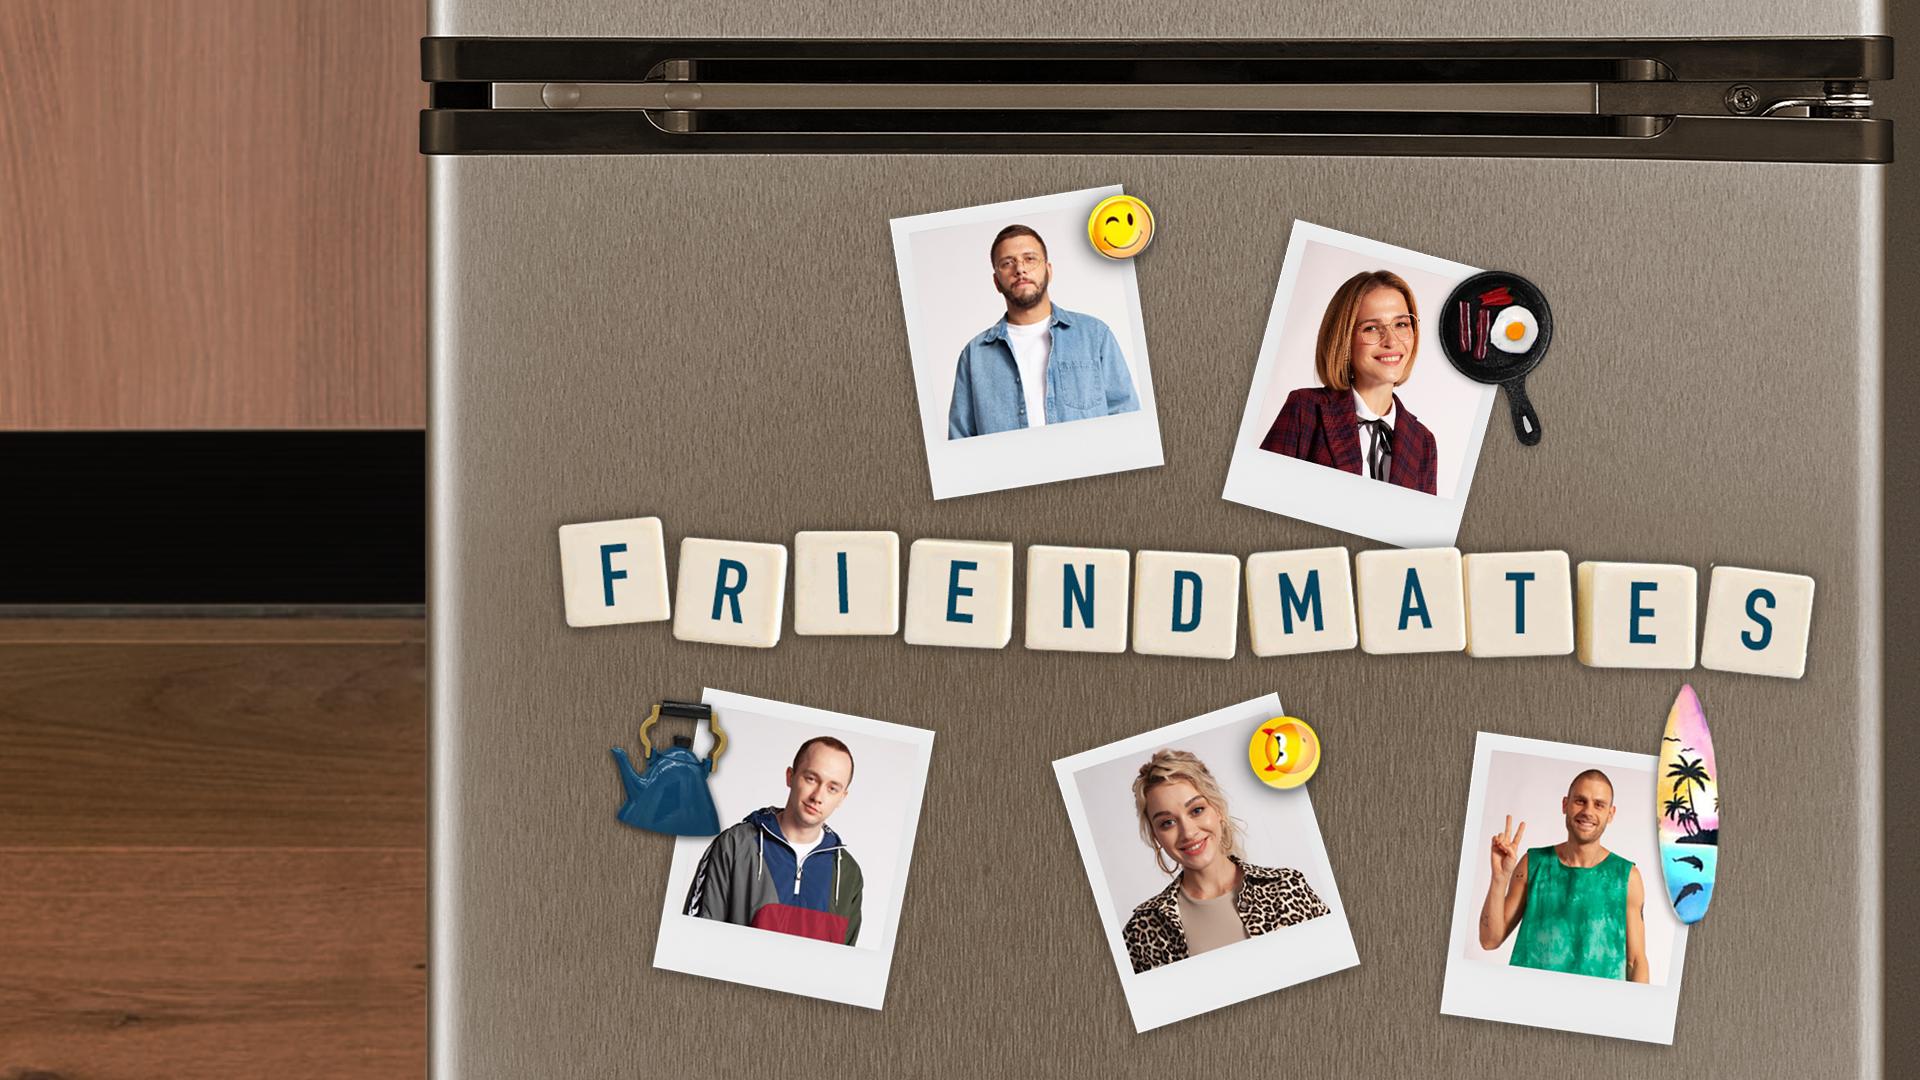 Friendmates